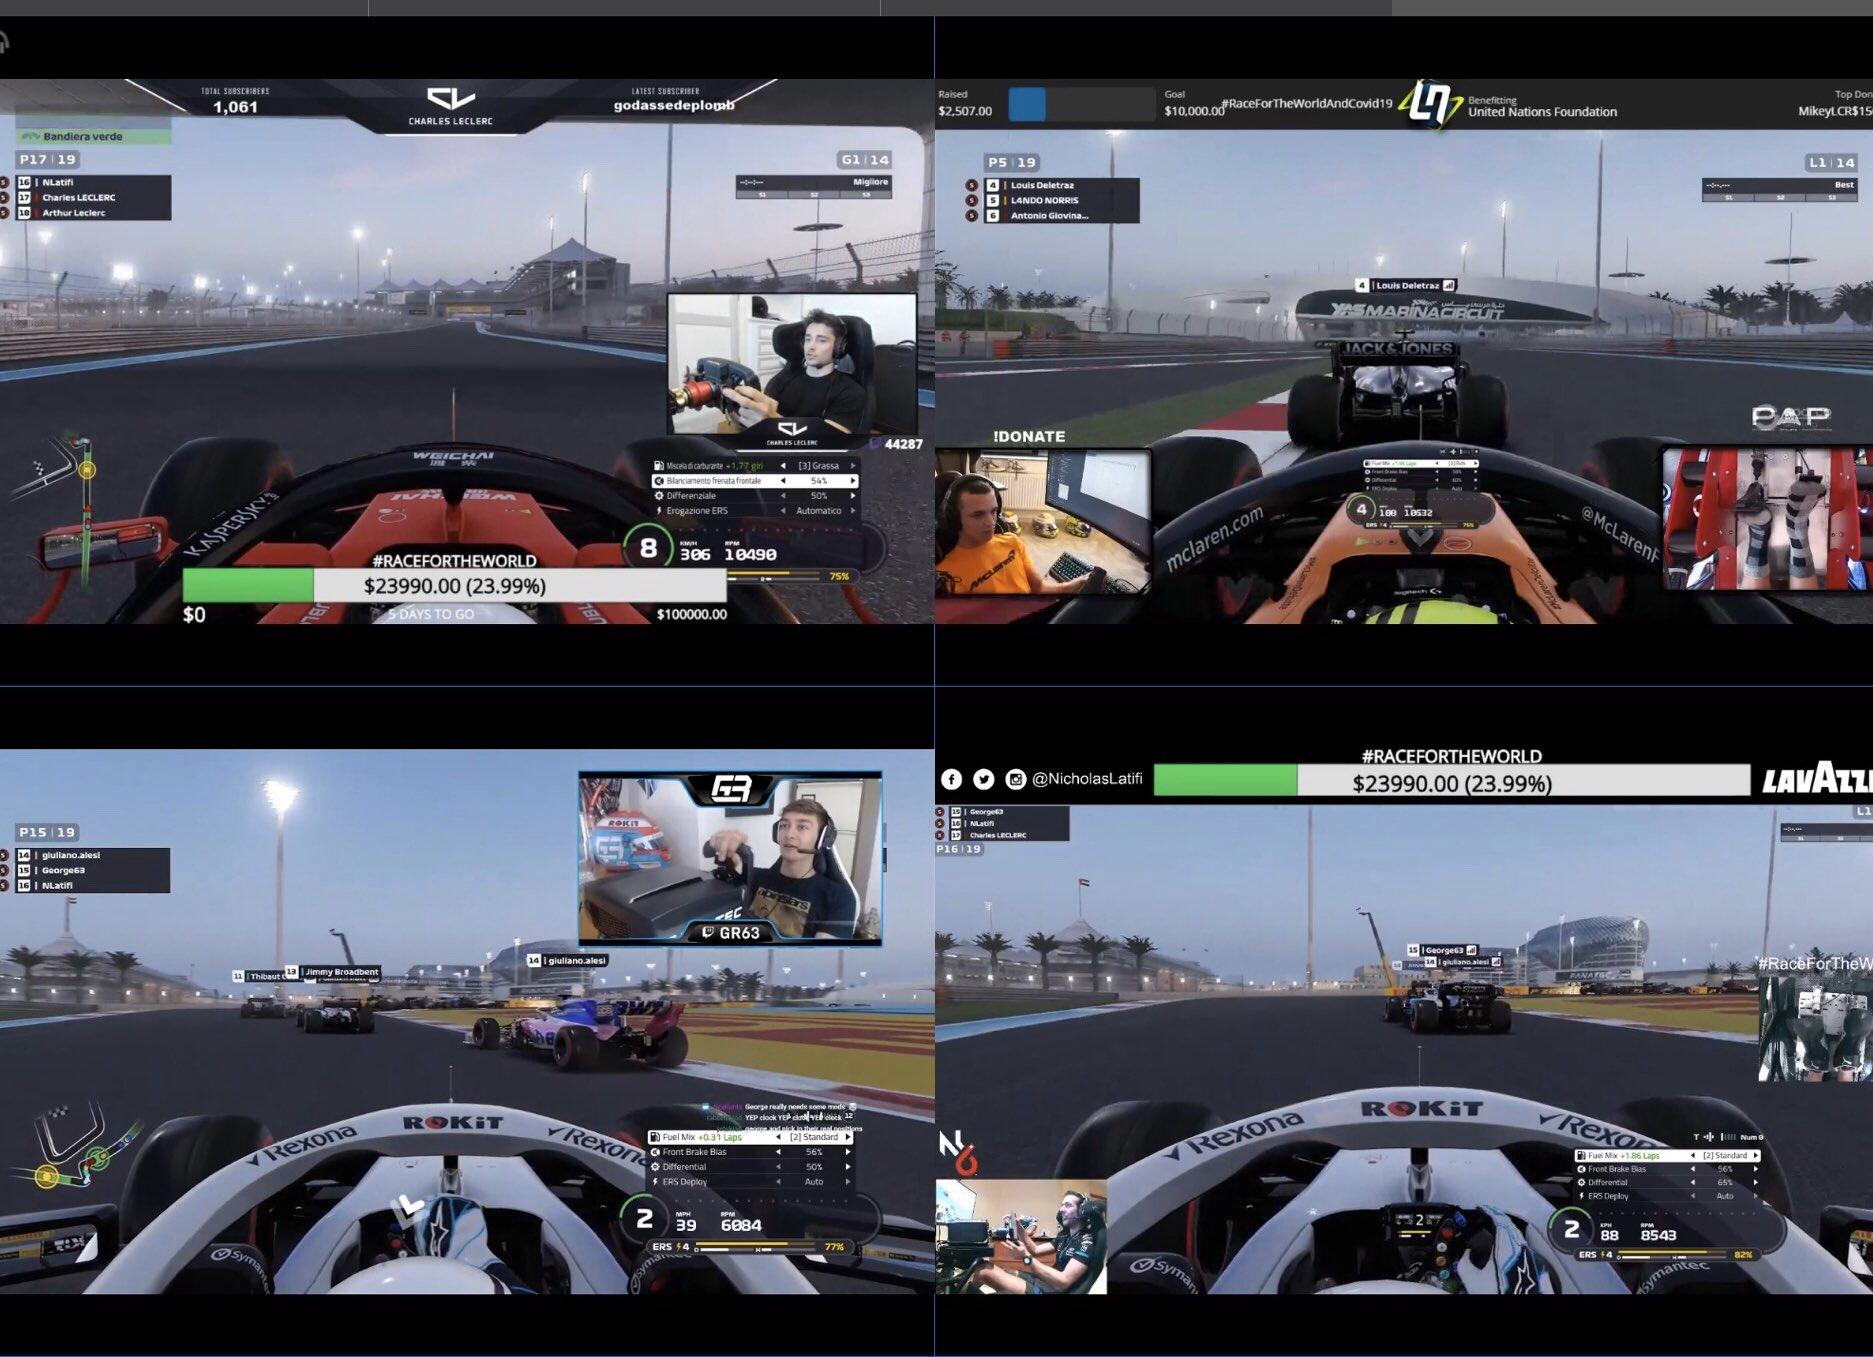 Des pilotes de F1 lancent un championnat virtuel caritatif